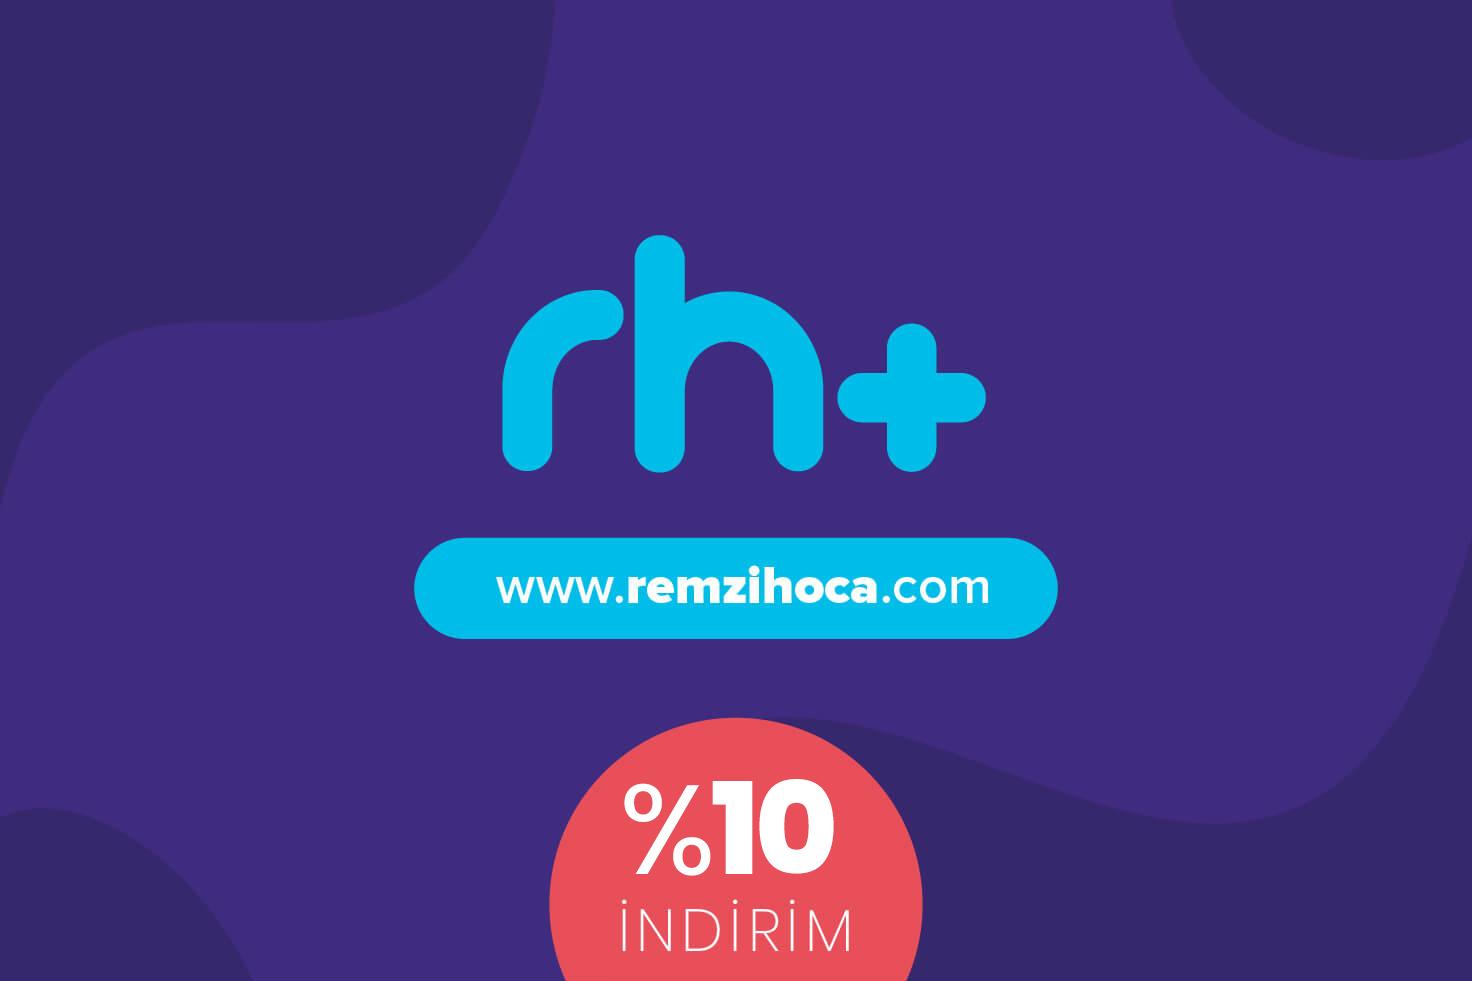 www.remzihoca.com Öğrencilerine %20 İndirim